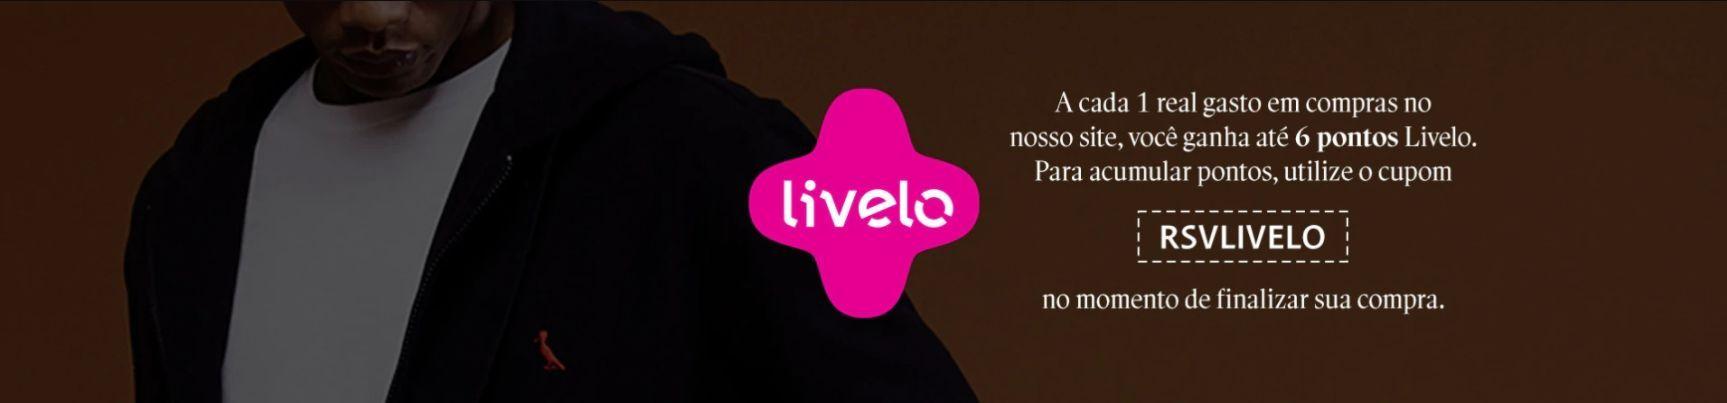 Livelo Reserva